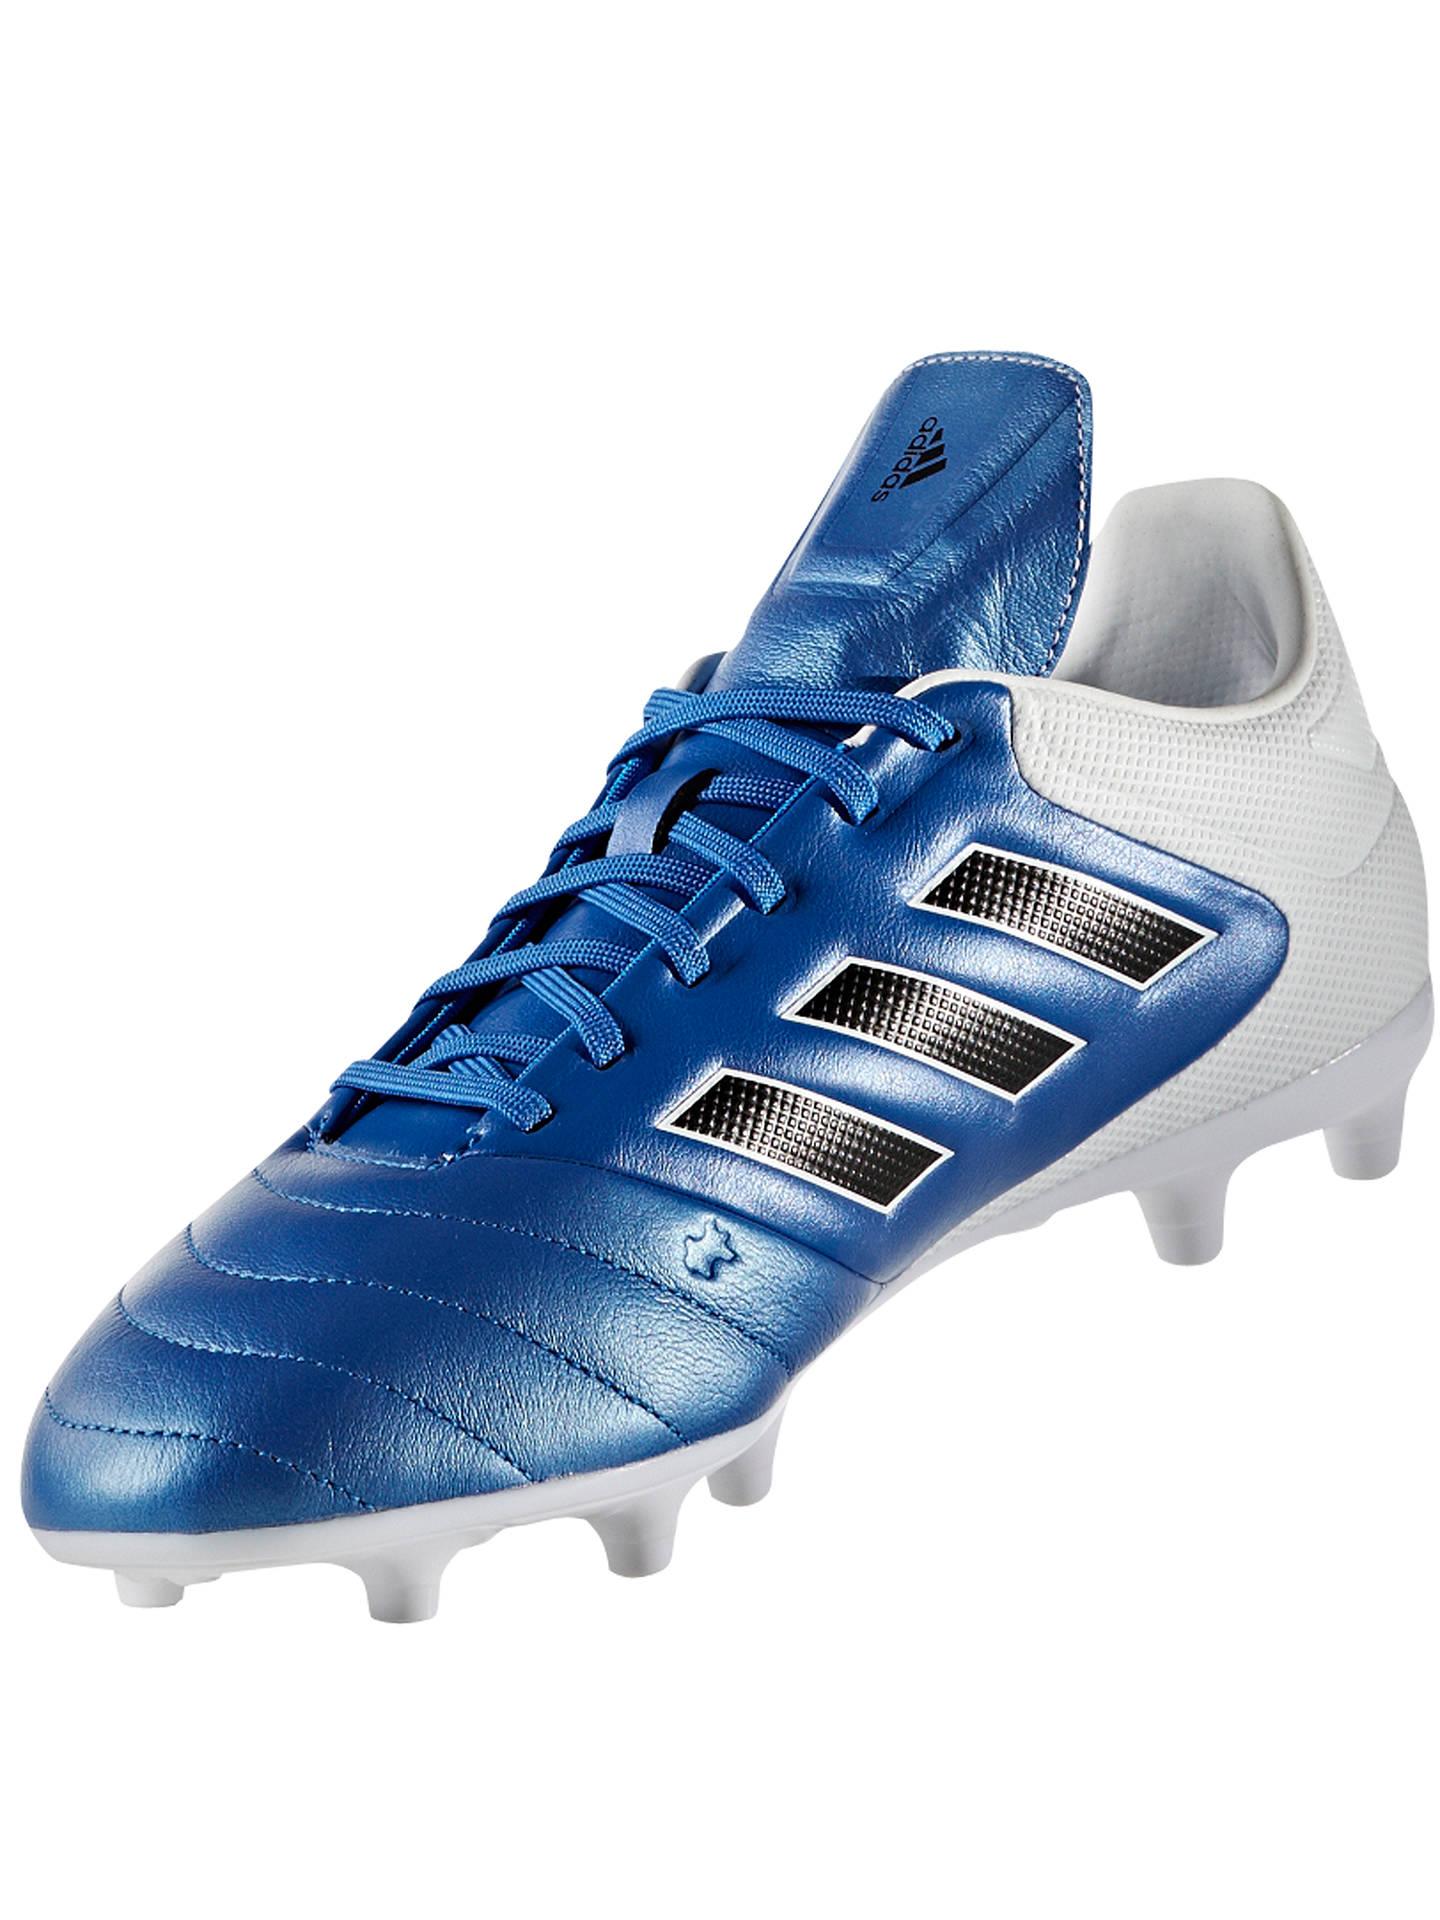 b86ca65cdeb2 Adidas Copa 17.3 FG Men s Football Boots at John Lewis   Partners